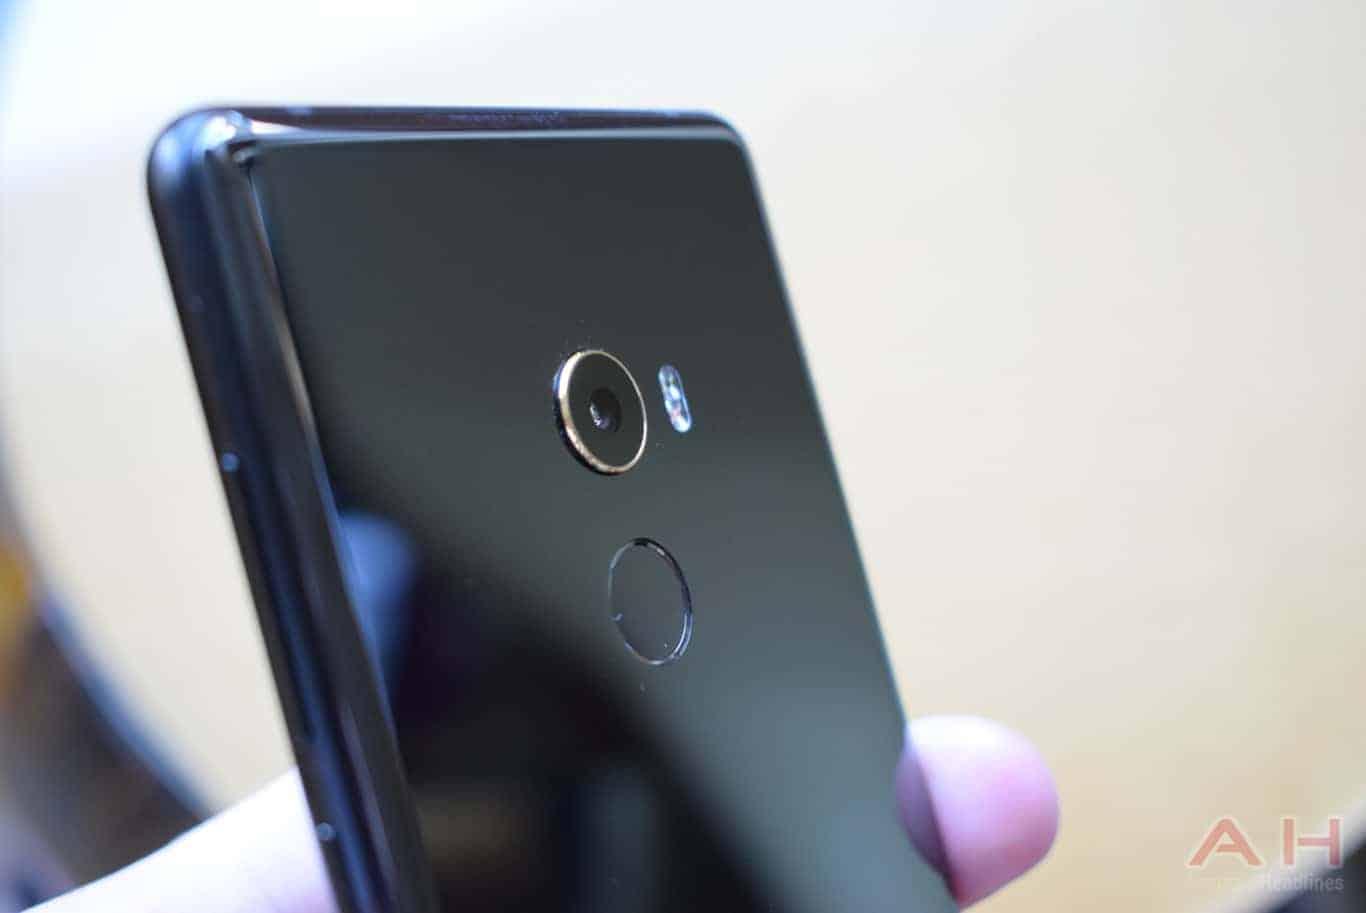 Xiaomi Mi MIX 2 Hands On AM AH 12